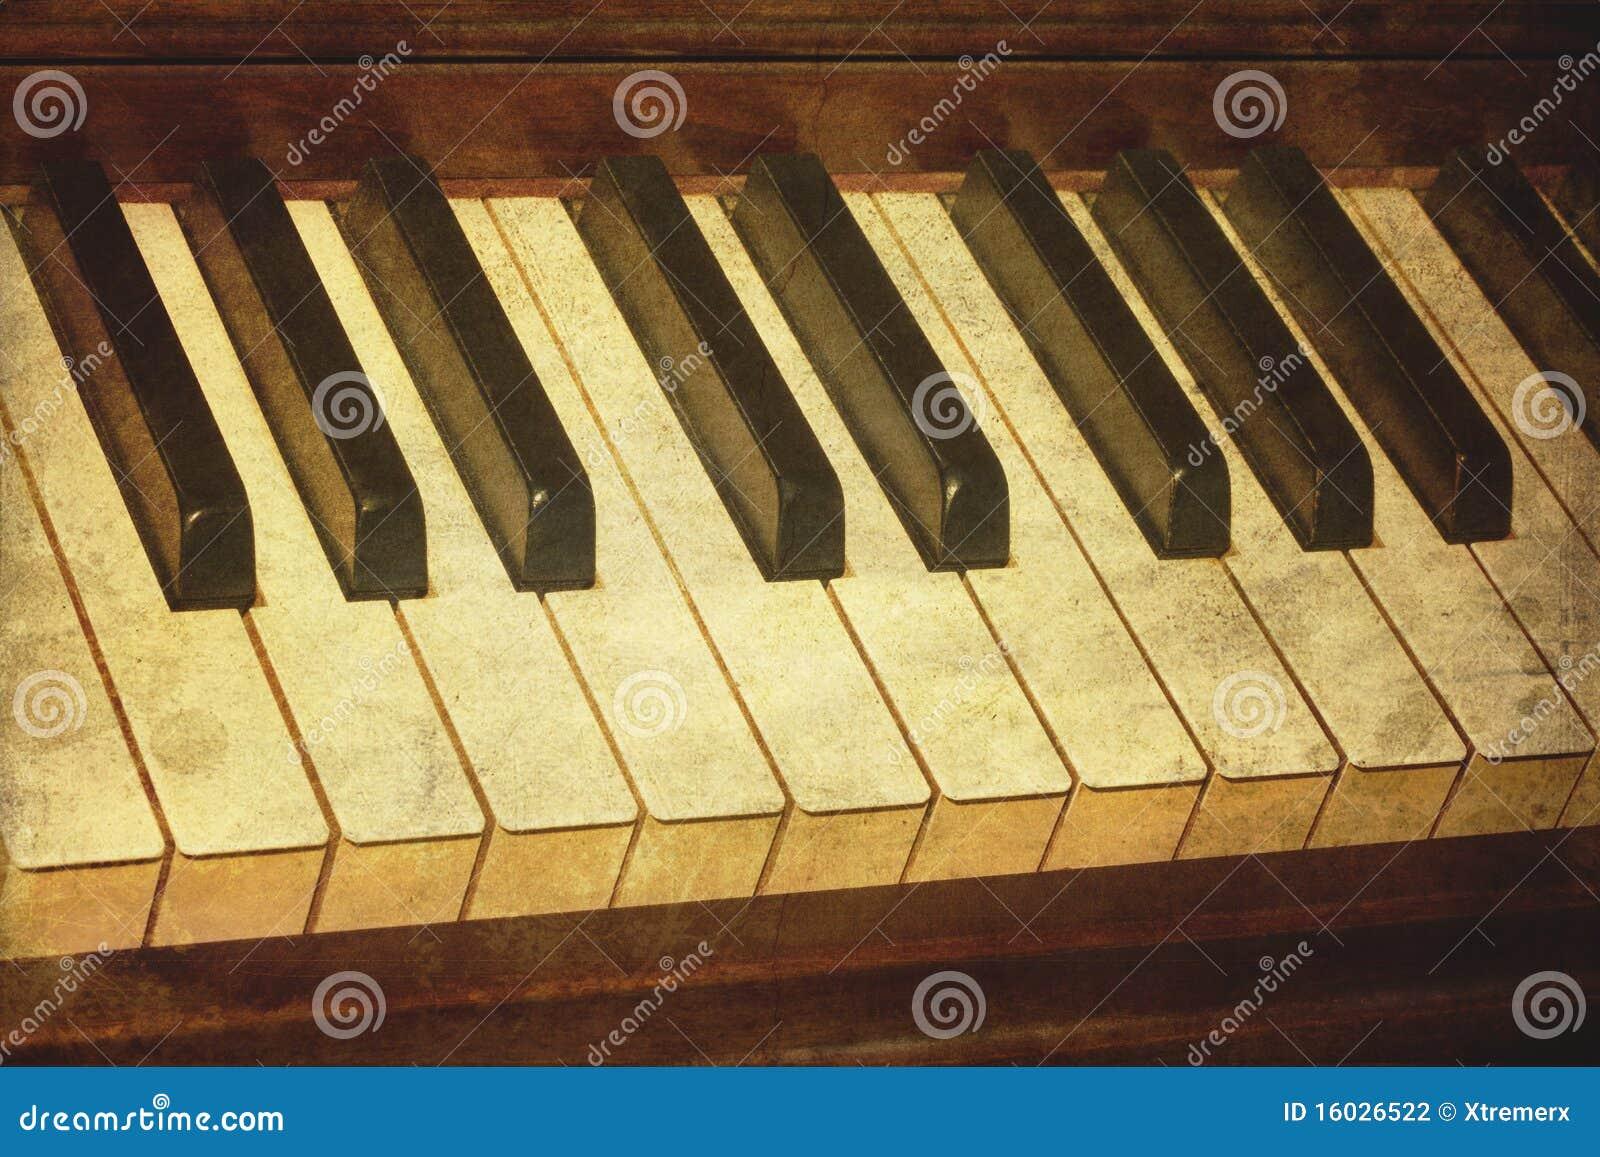 photo old piano - photo #49